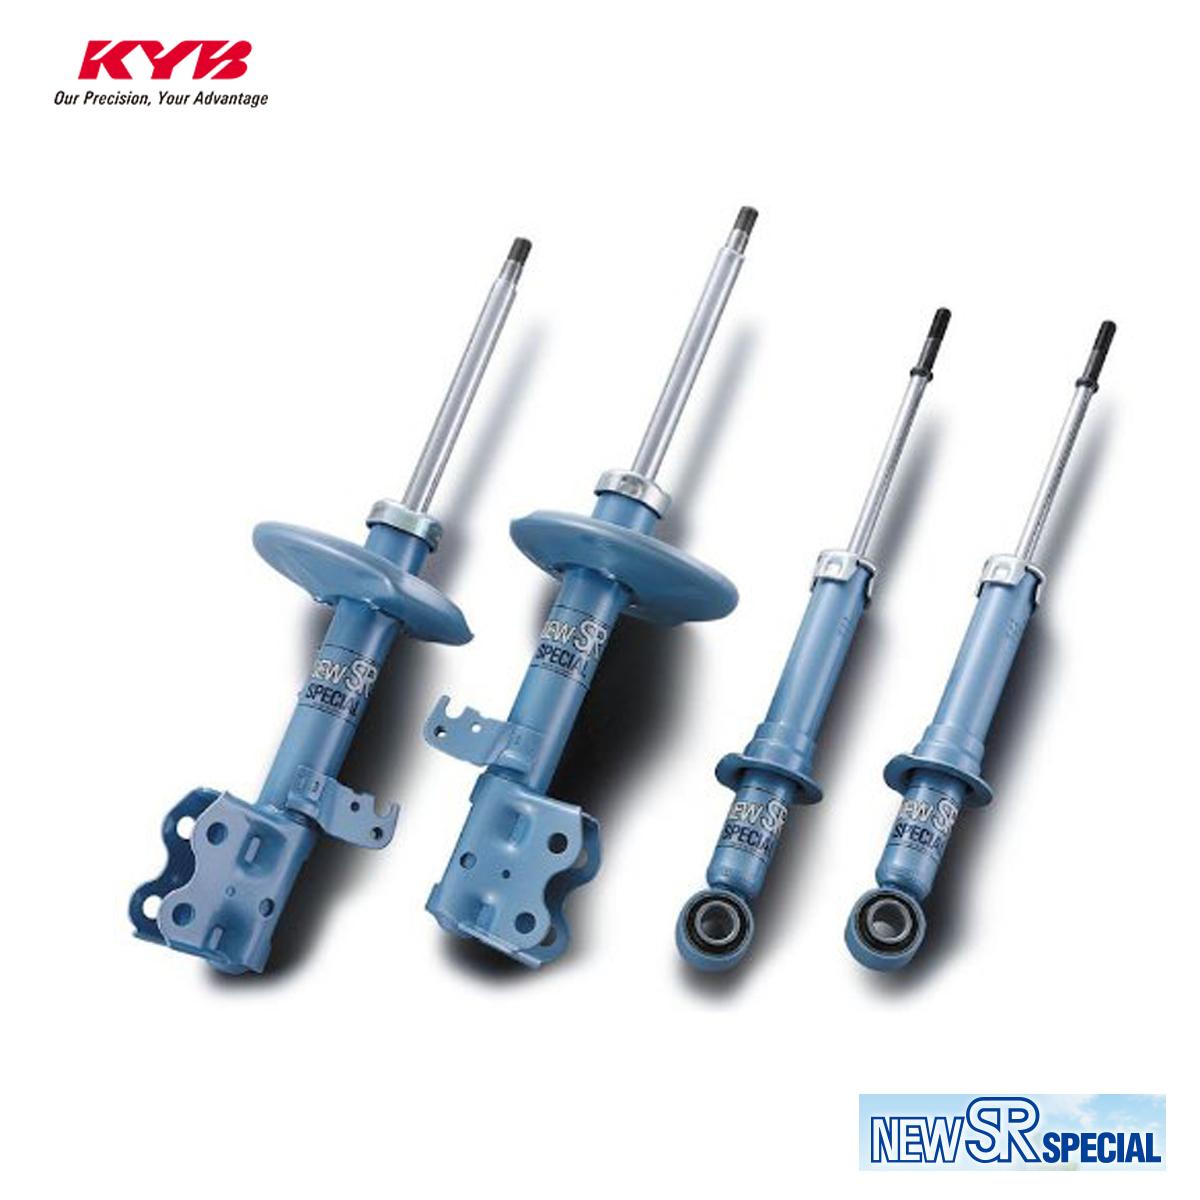 KYB カヤバ RAV 4 SXA10C G/SXA15G ショックアブソーバー フロント 右用 1本 NEW SR SPECIAL NST5177R 配送先条件有り